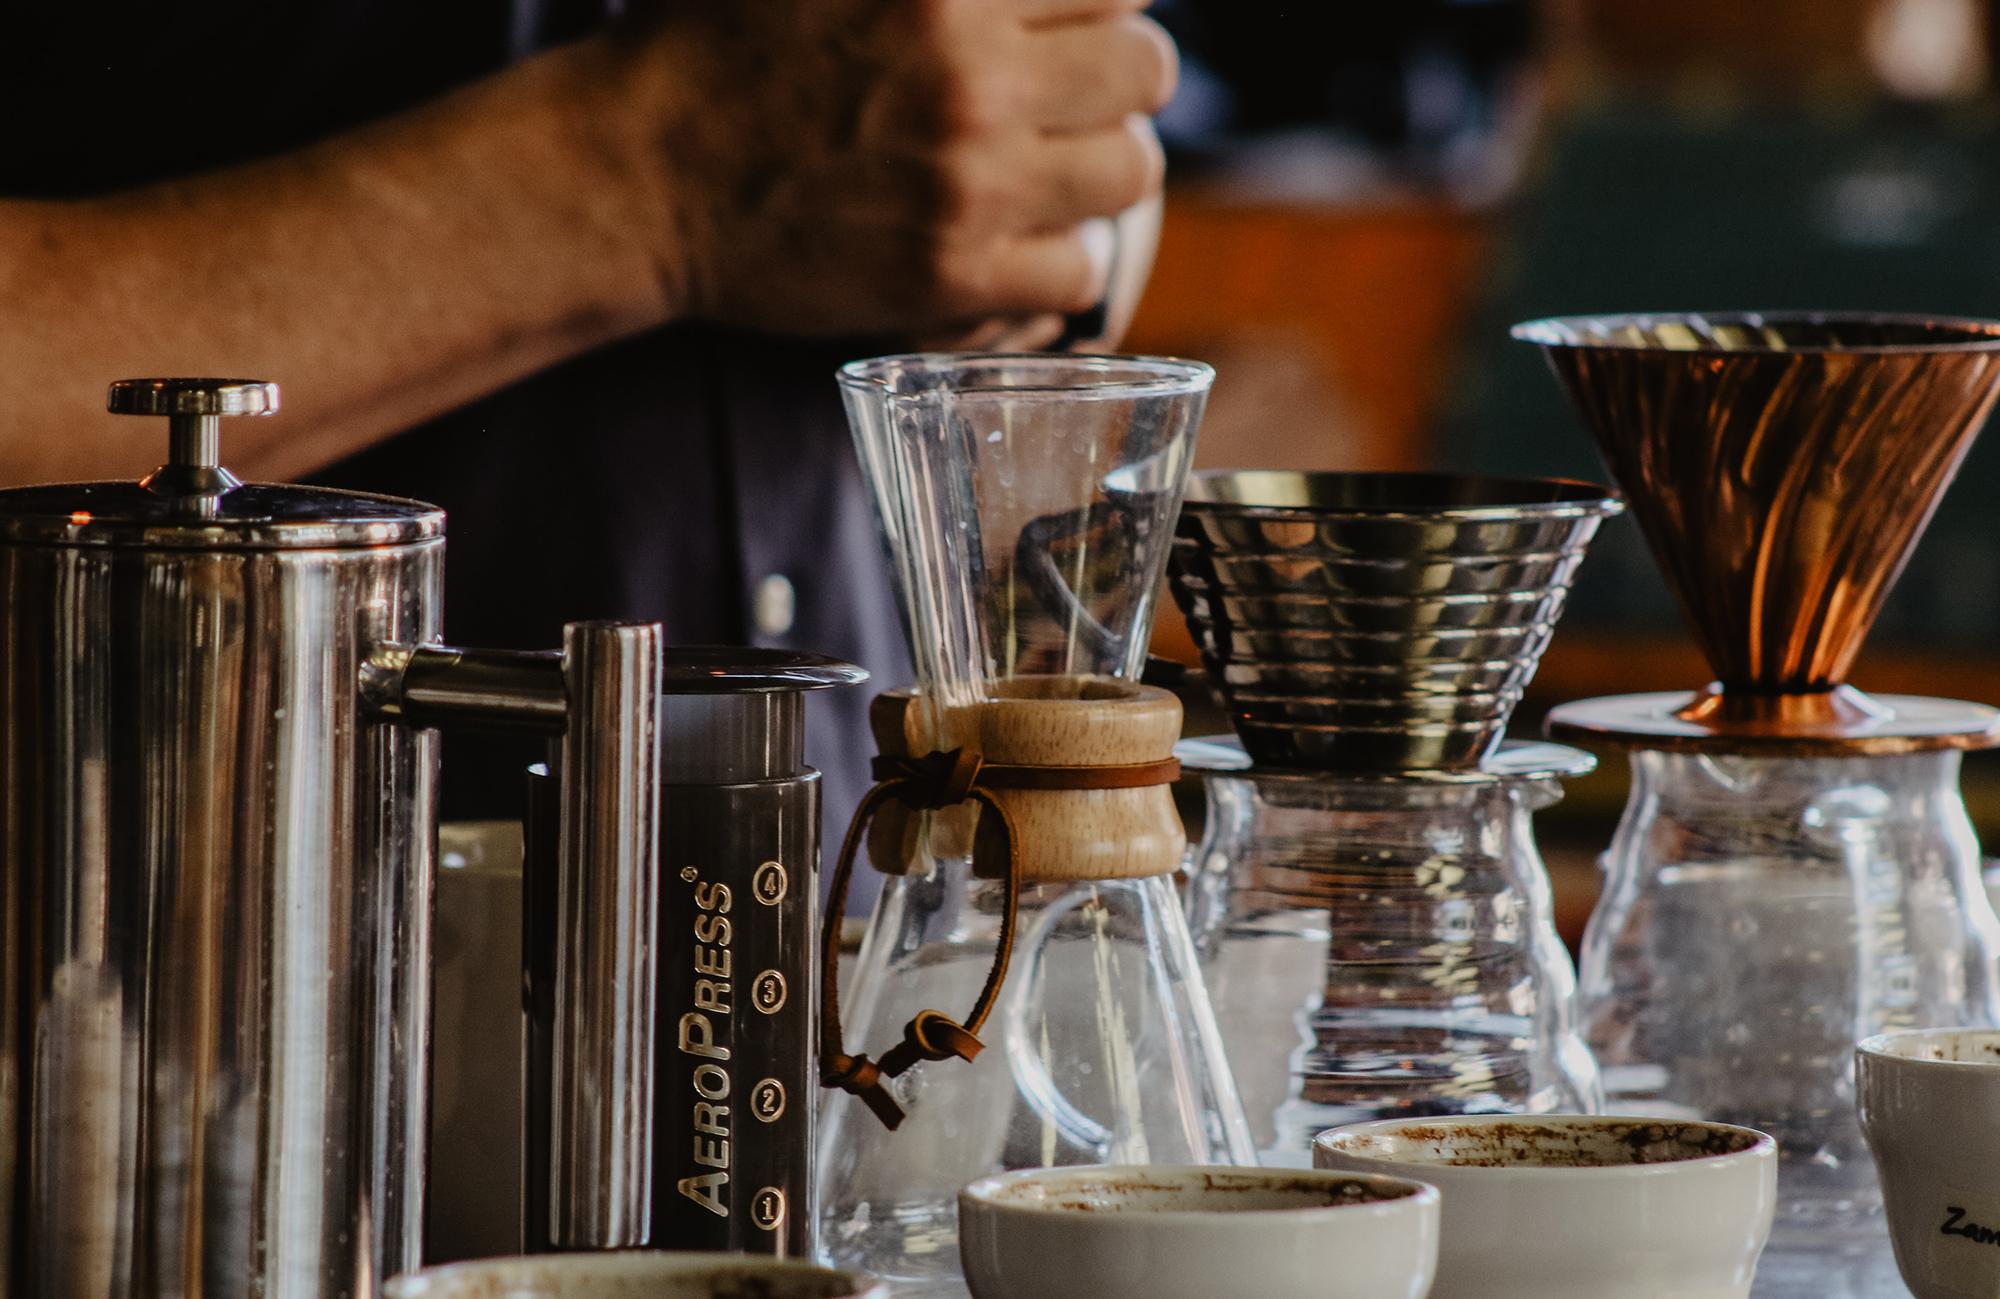 Filter Coffee brewing tools including V60, Chemex & Aeropress